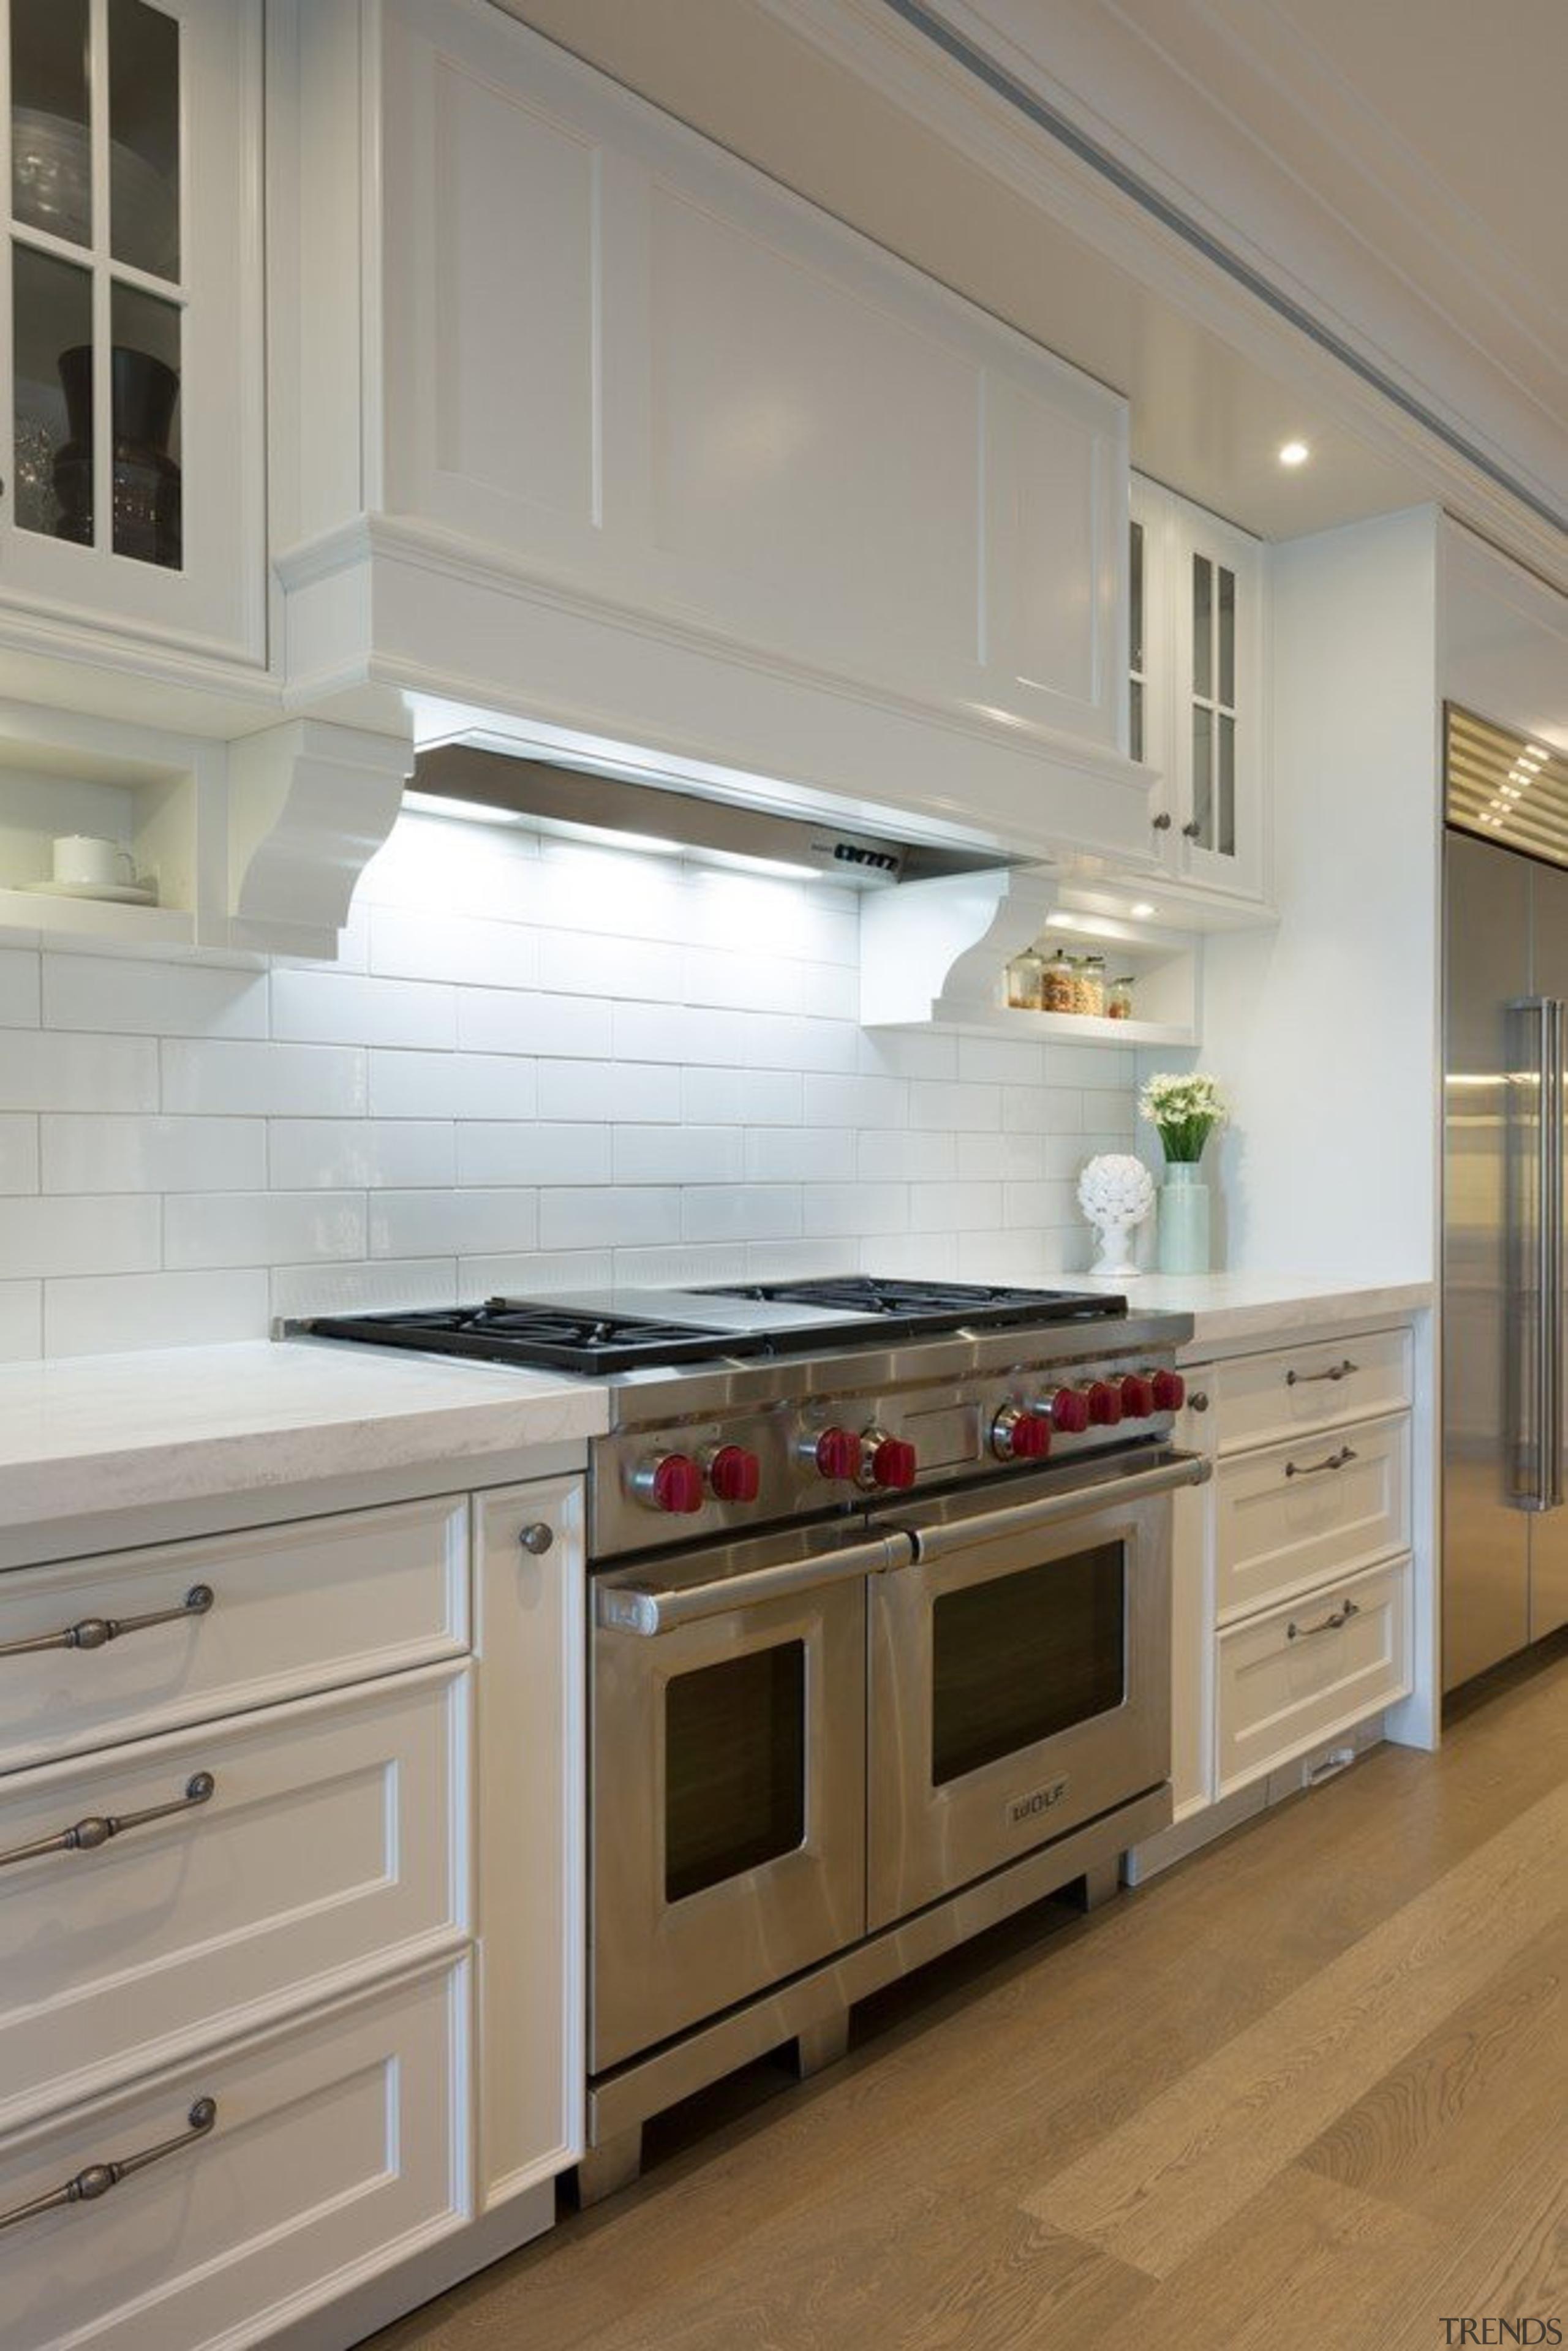 Kitchen - cabinetry | countertop | cuisine classique cabinetry, countertop, cuisine classique, floor, flooring, home appliance, interior design, kitchen, room, gray